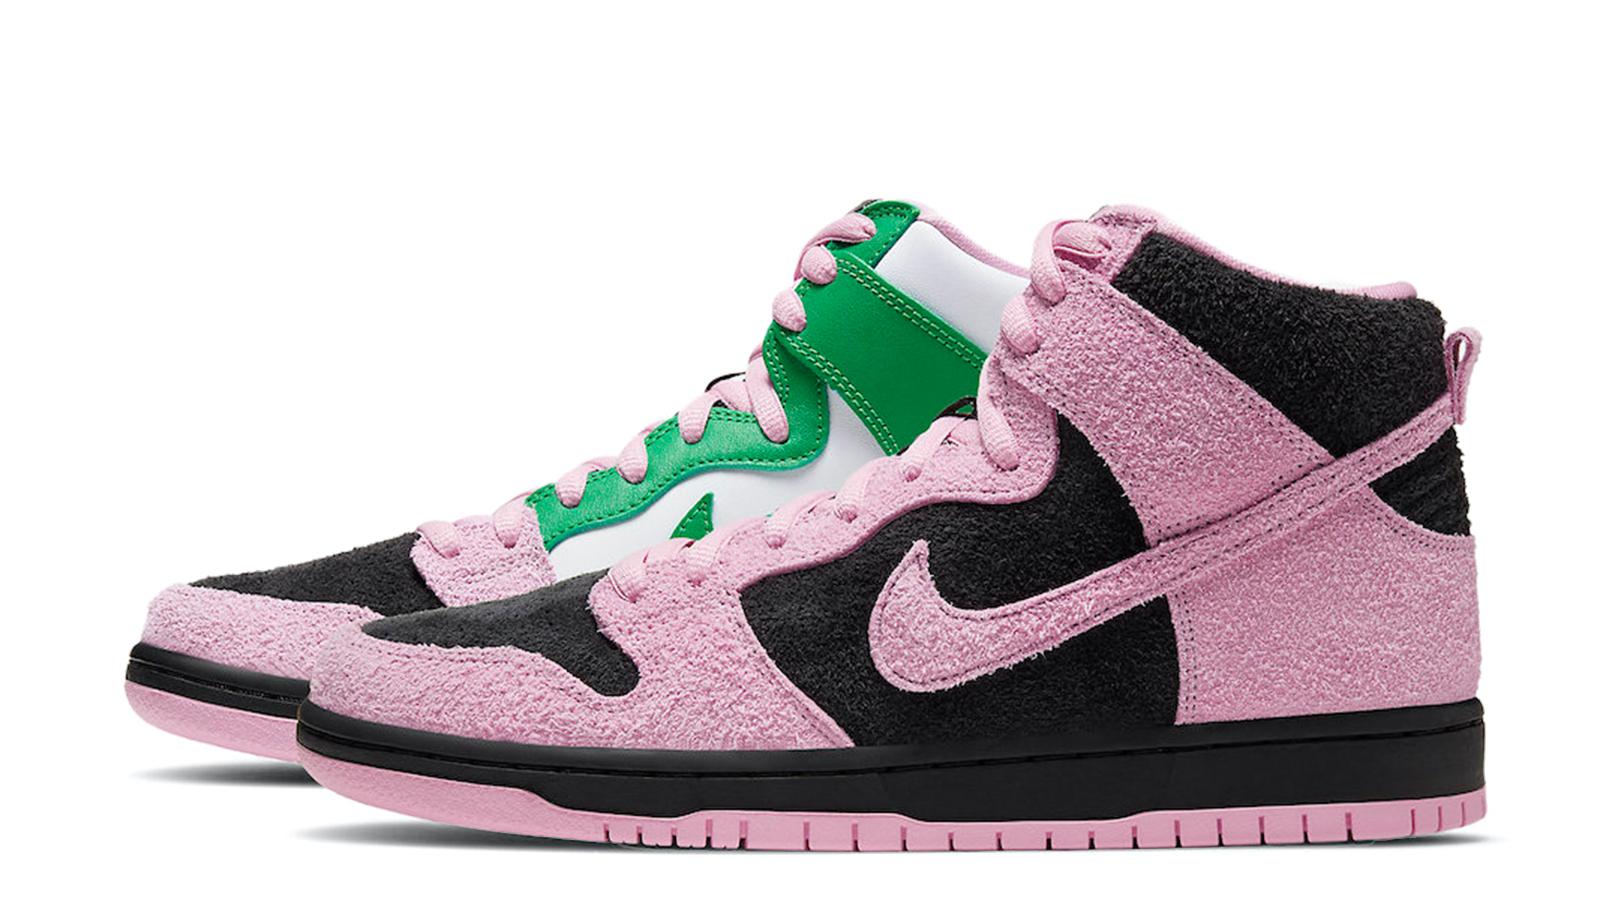 Nike SB Dunk High Invert Celtics CU7349-001